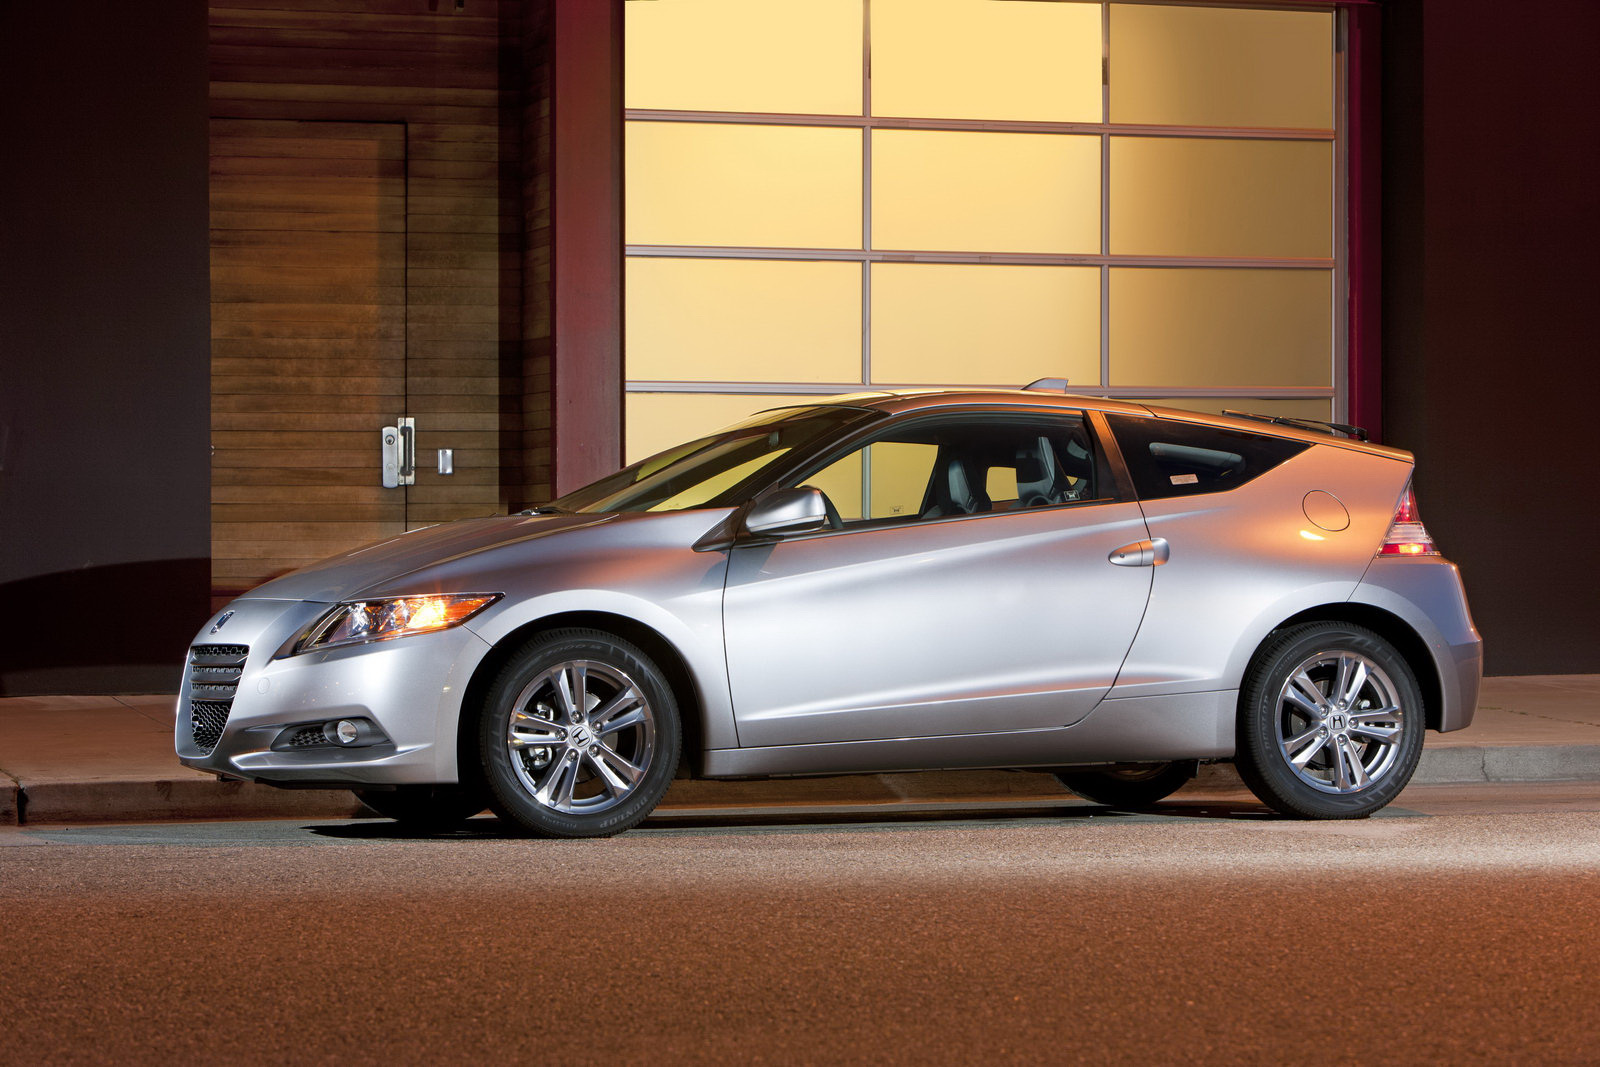 2011 Honda CR-Z on Sale August